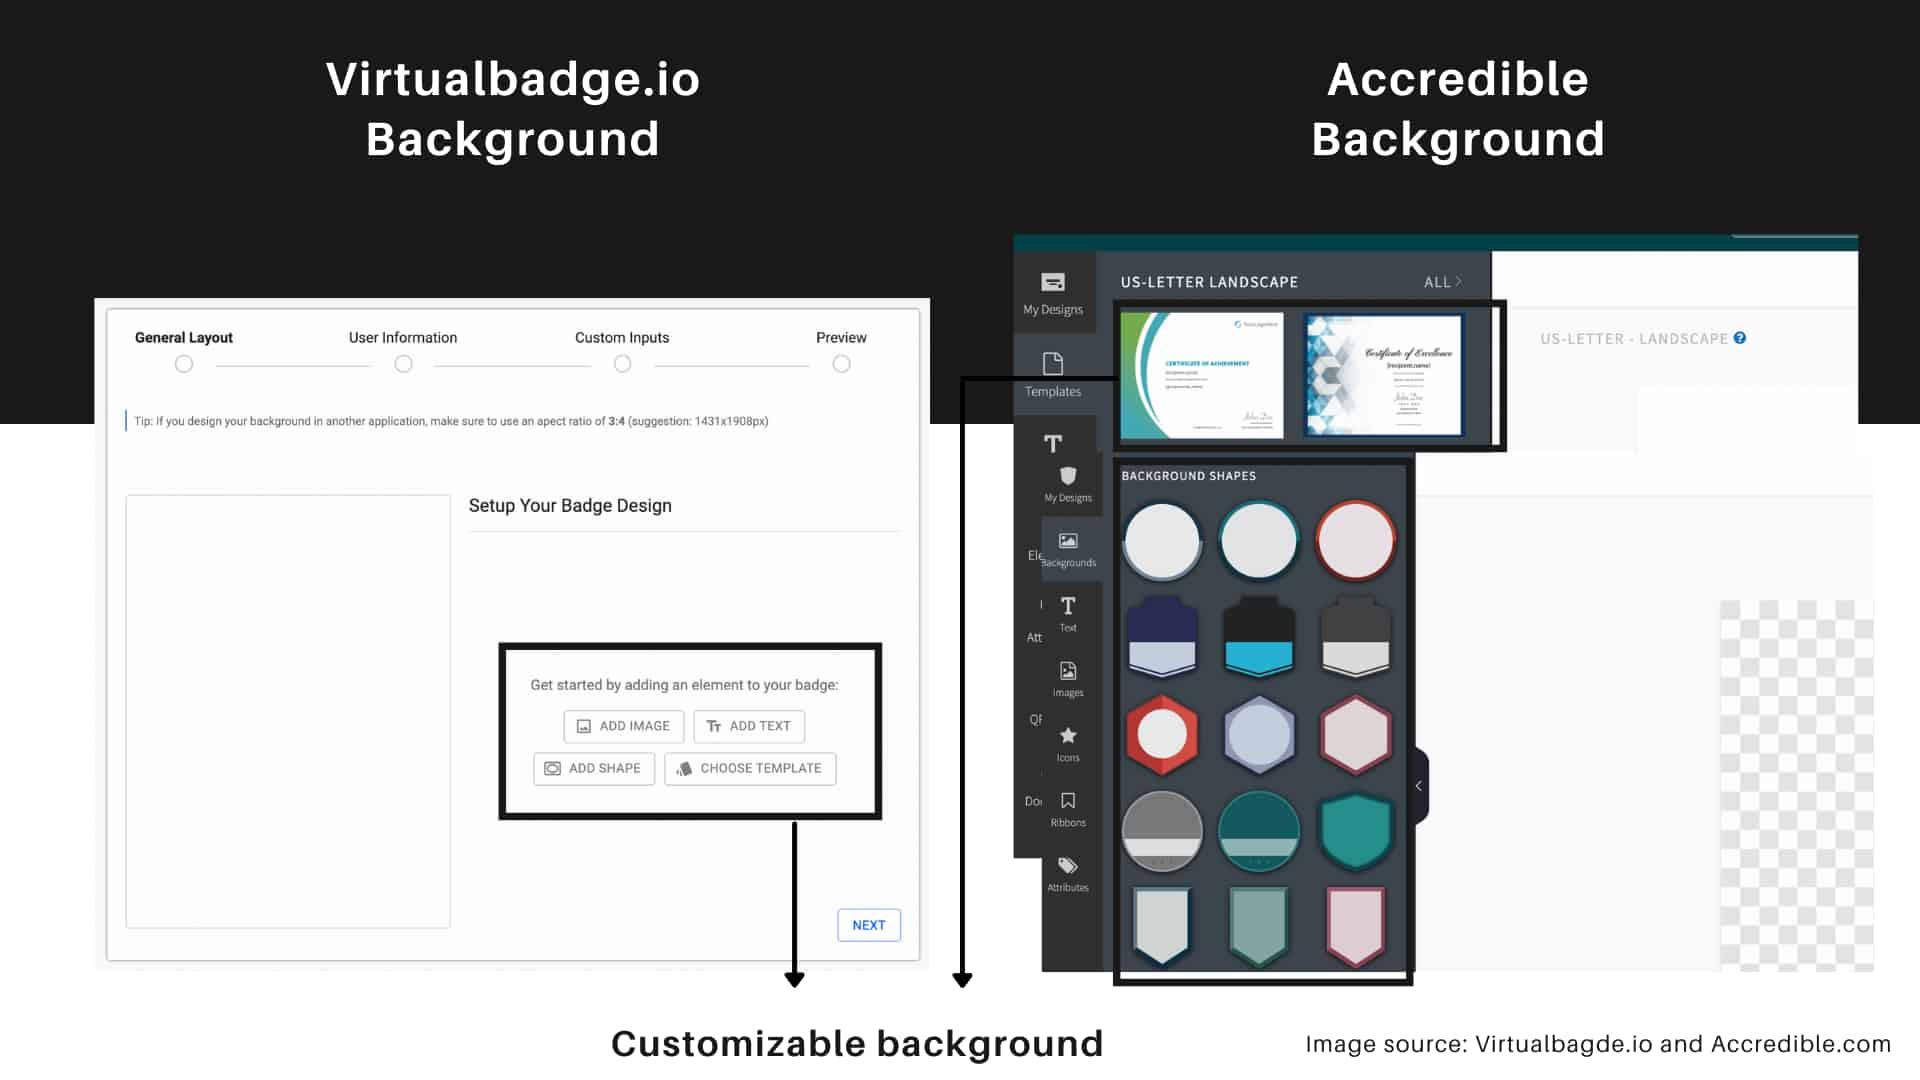 Virtualbadge.io vs. Accredible background of the badge design